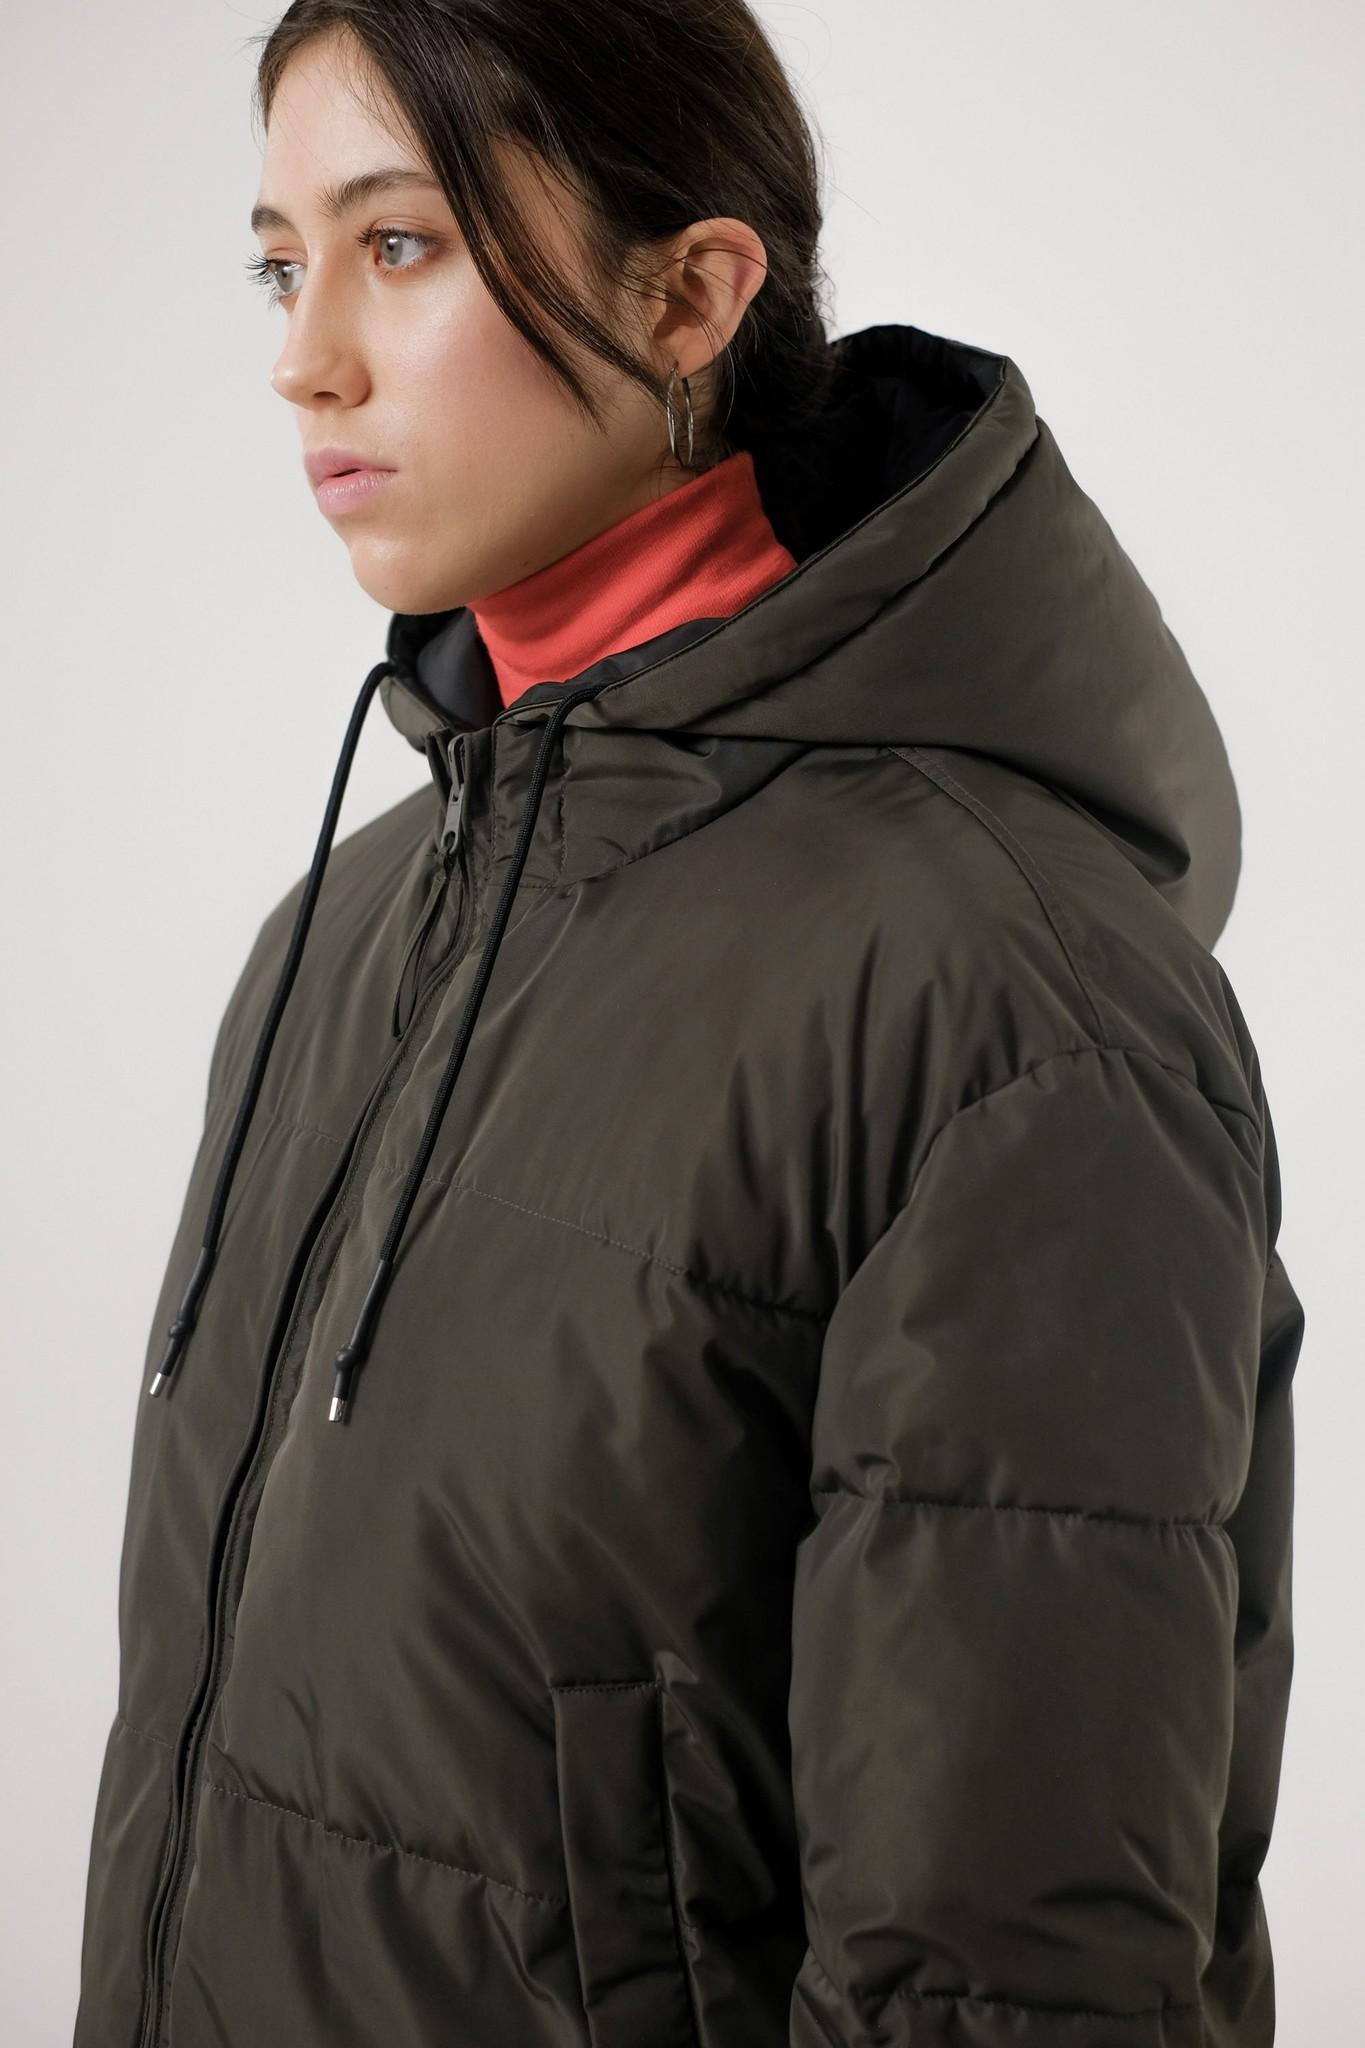 Rhymes Reversible Puffer Jacket Black Olive-2